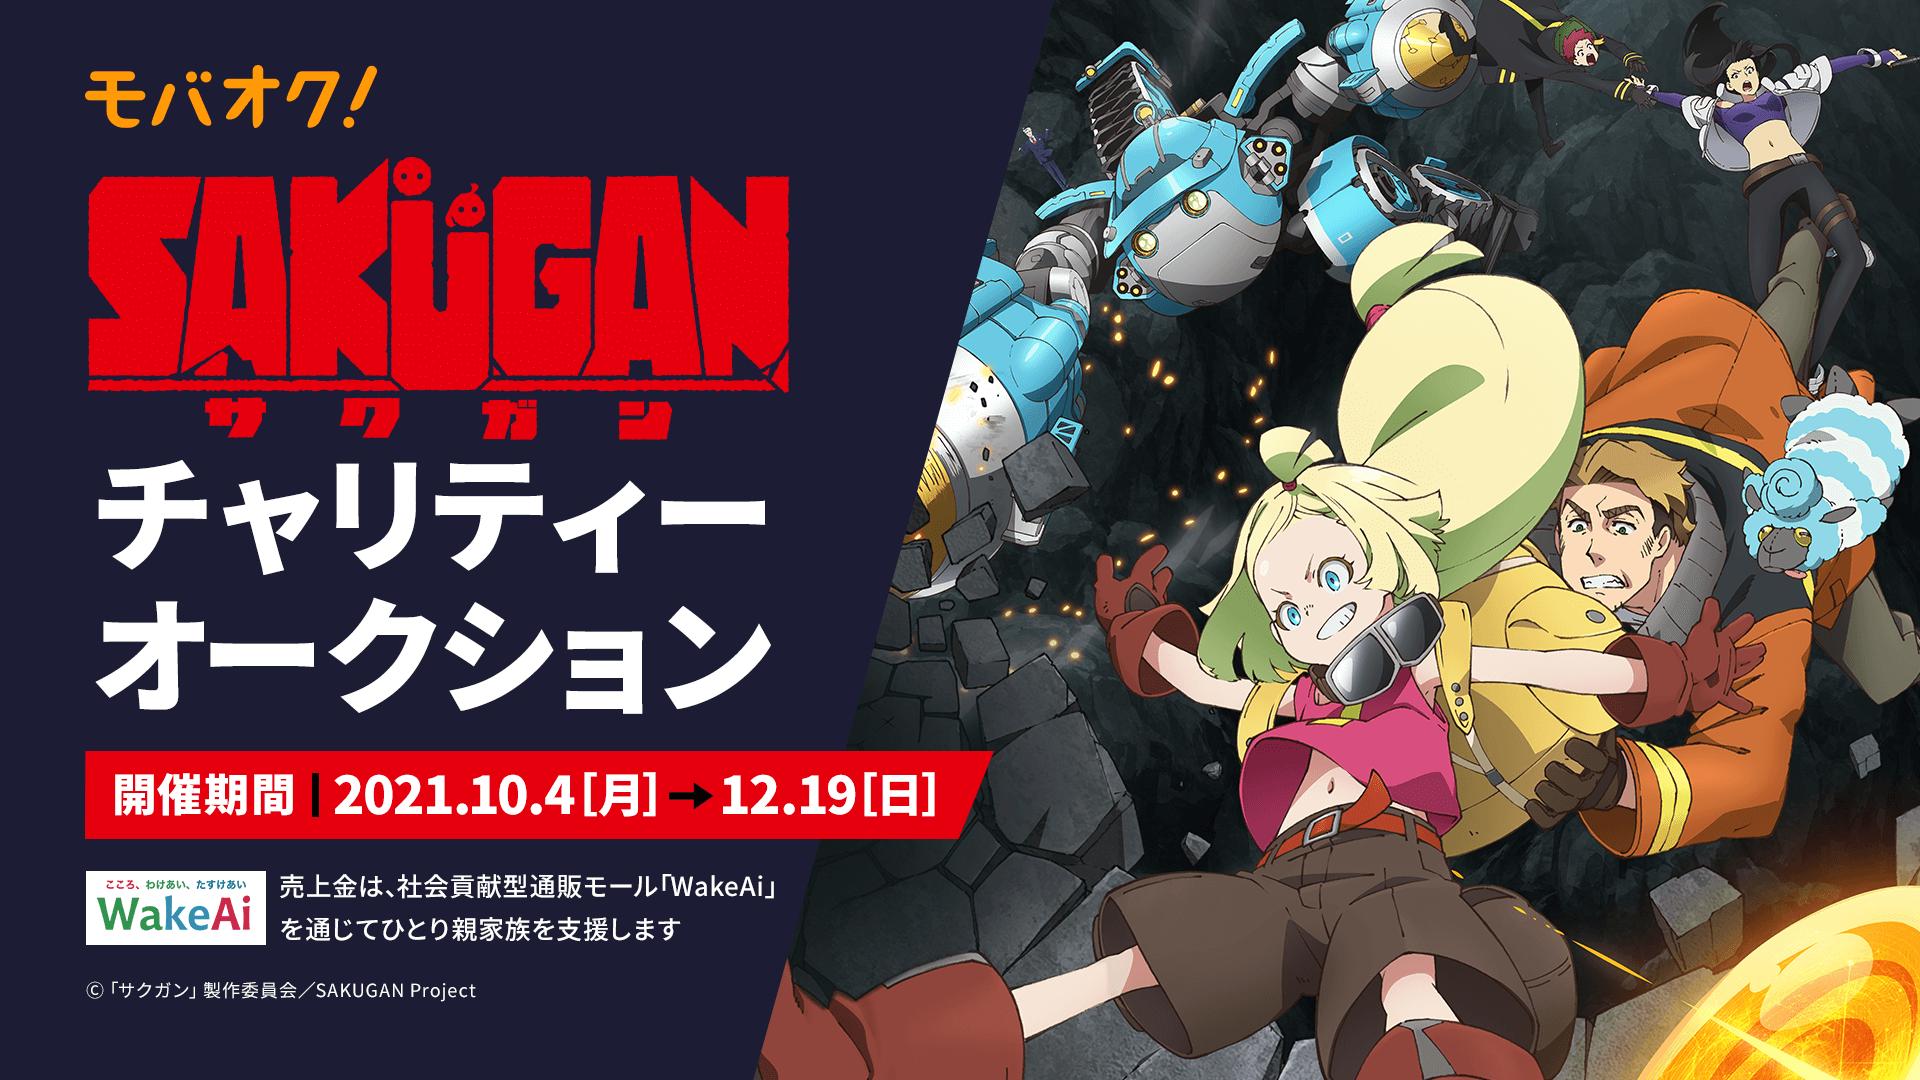 TVアニメ「サクガン」のサイン入りグッズを出品するチャリティオークションを開催